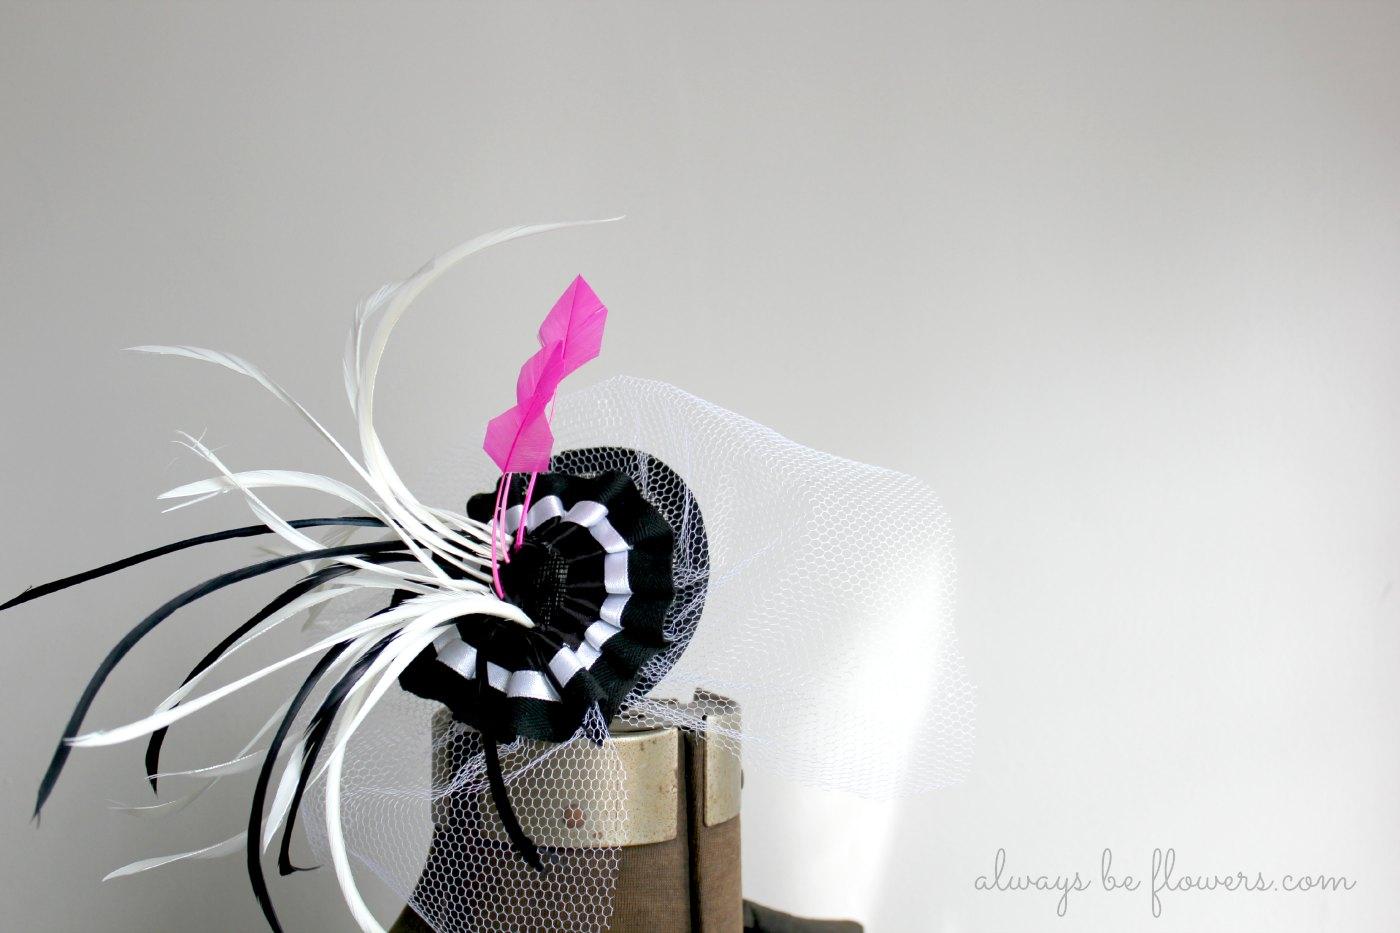 A fascinator designed for a black and site striped dress